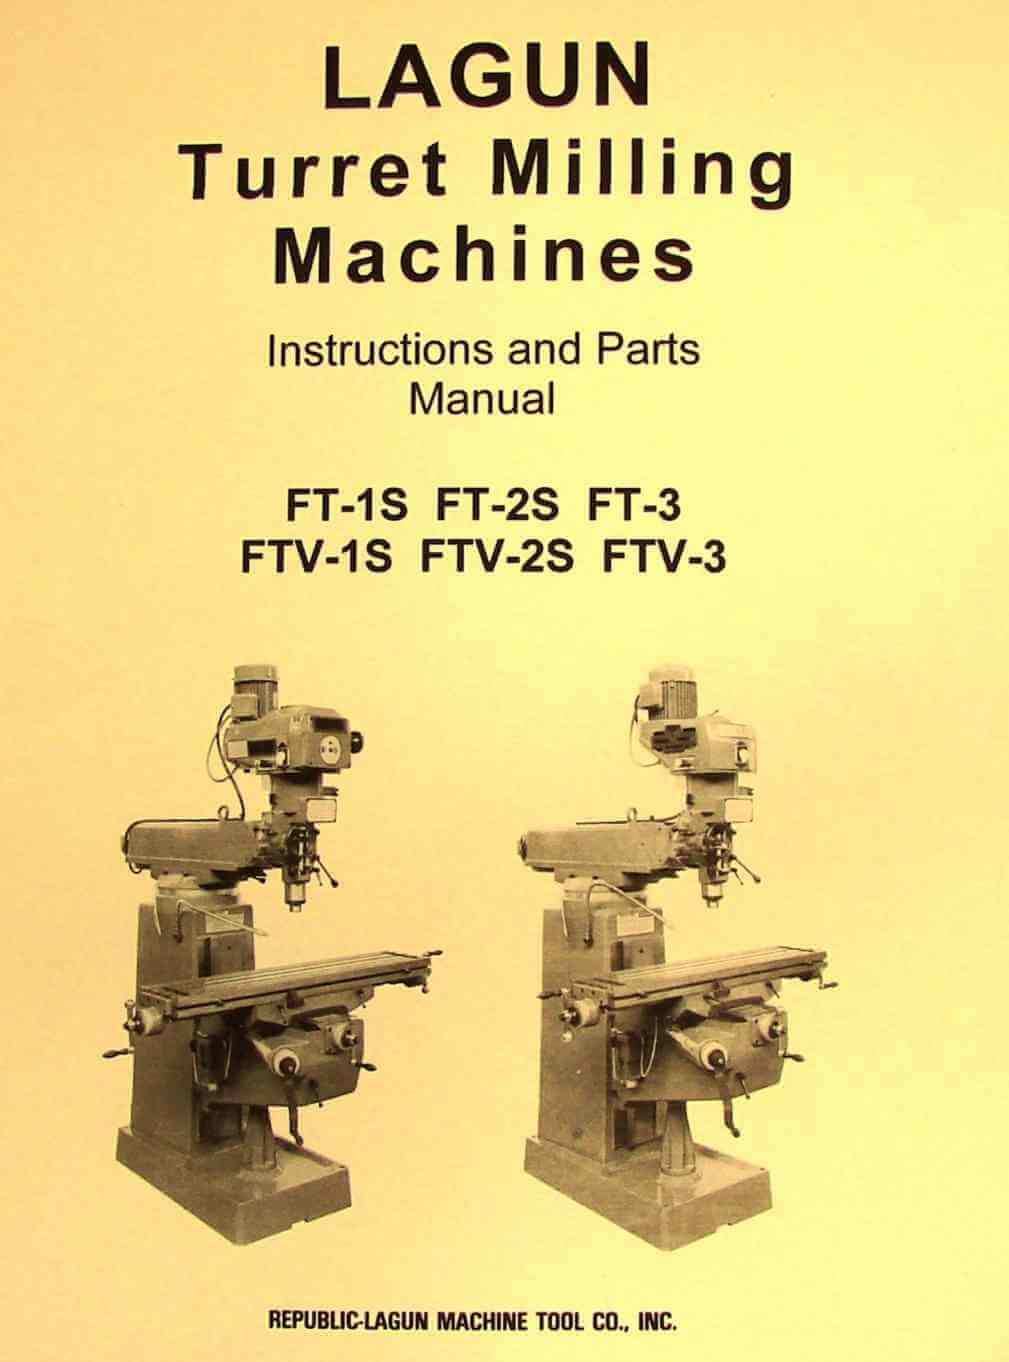 LAGUN FTV-1S FTV-2S FTV-3S Vertical Milling Machine Operator & Parts Manual  | Ozark Tool Manuals & Books